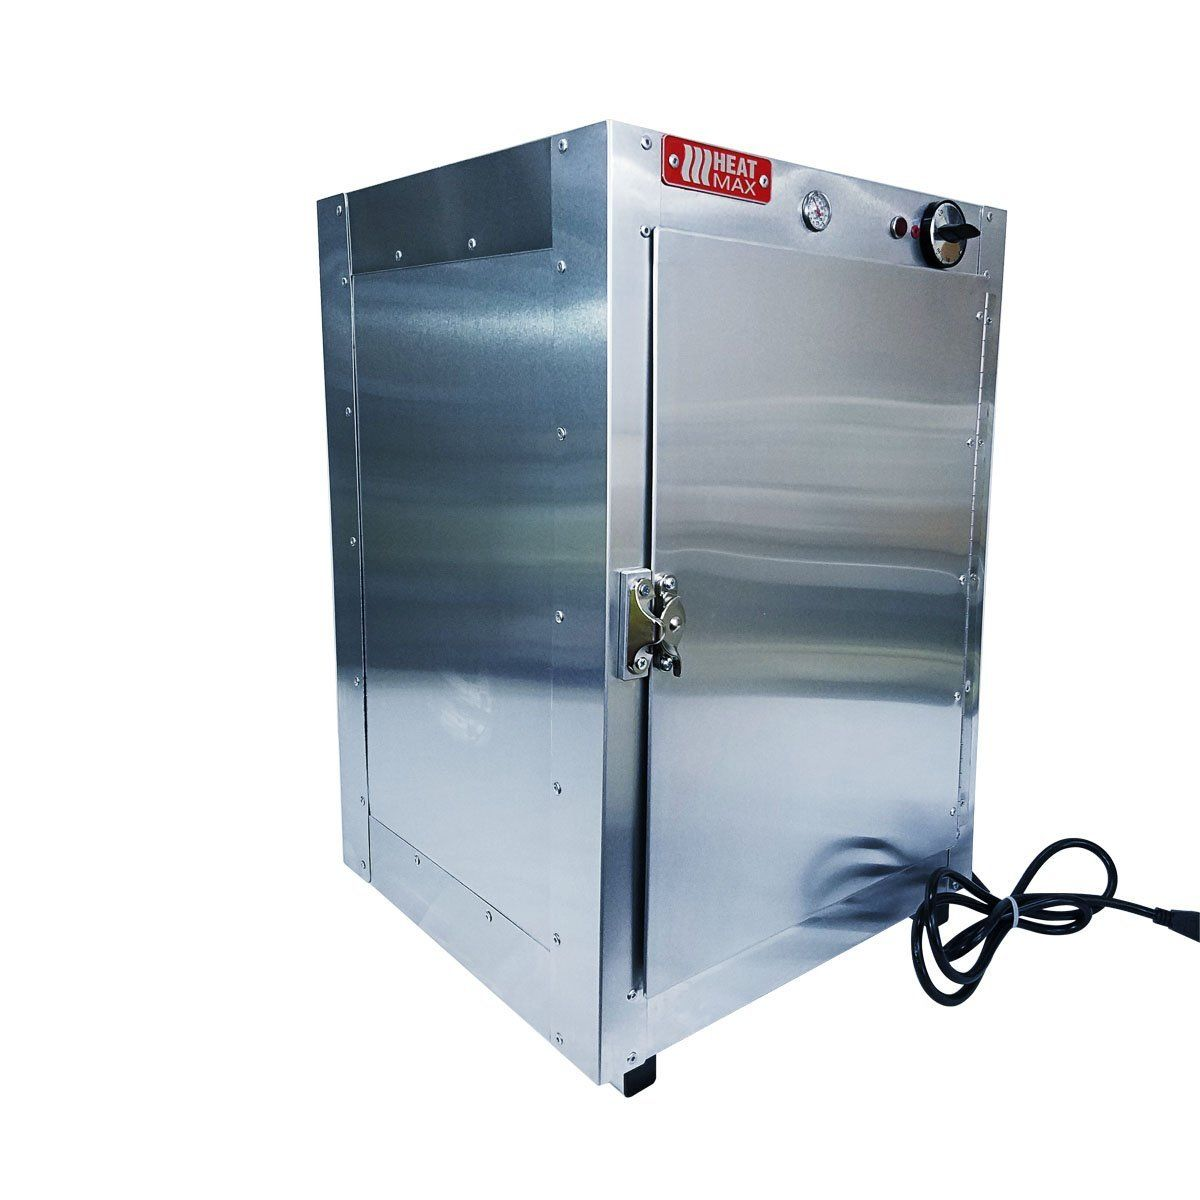 Amazon.com: HeatMax Commercial Food Pastry Warming Case Aluminum ...